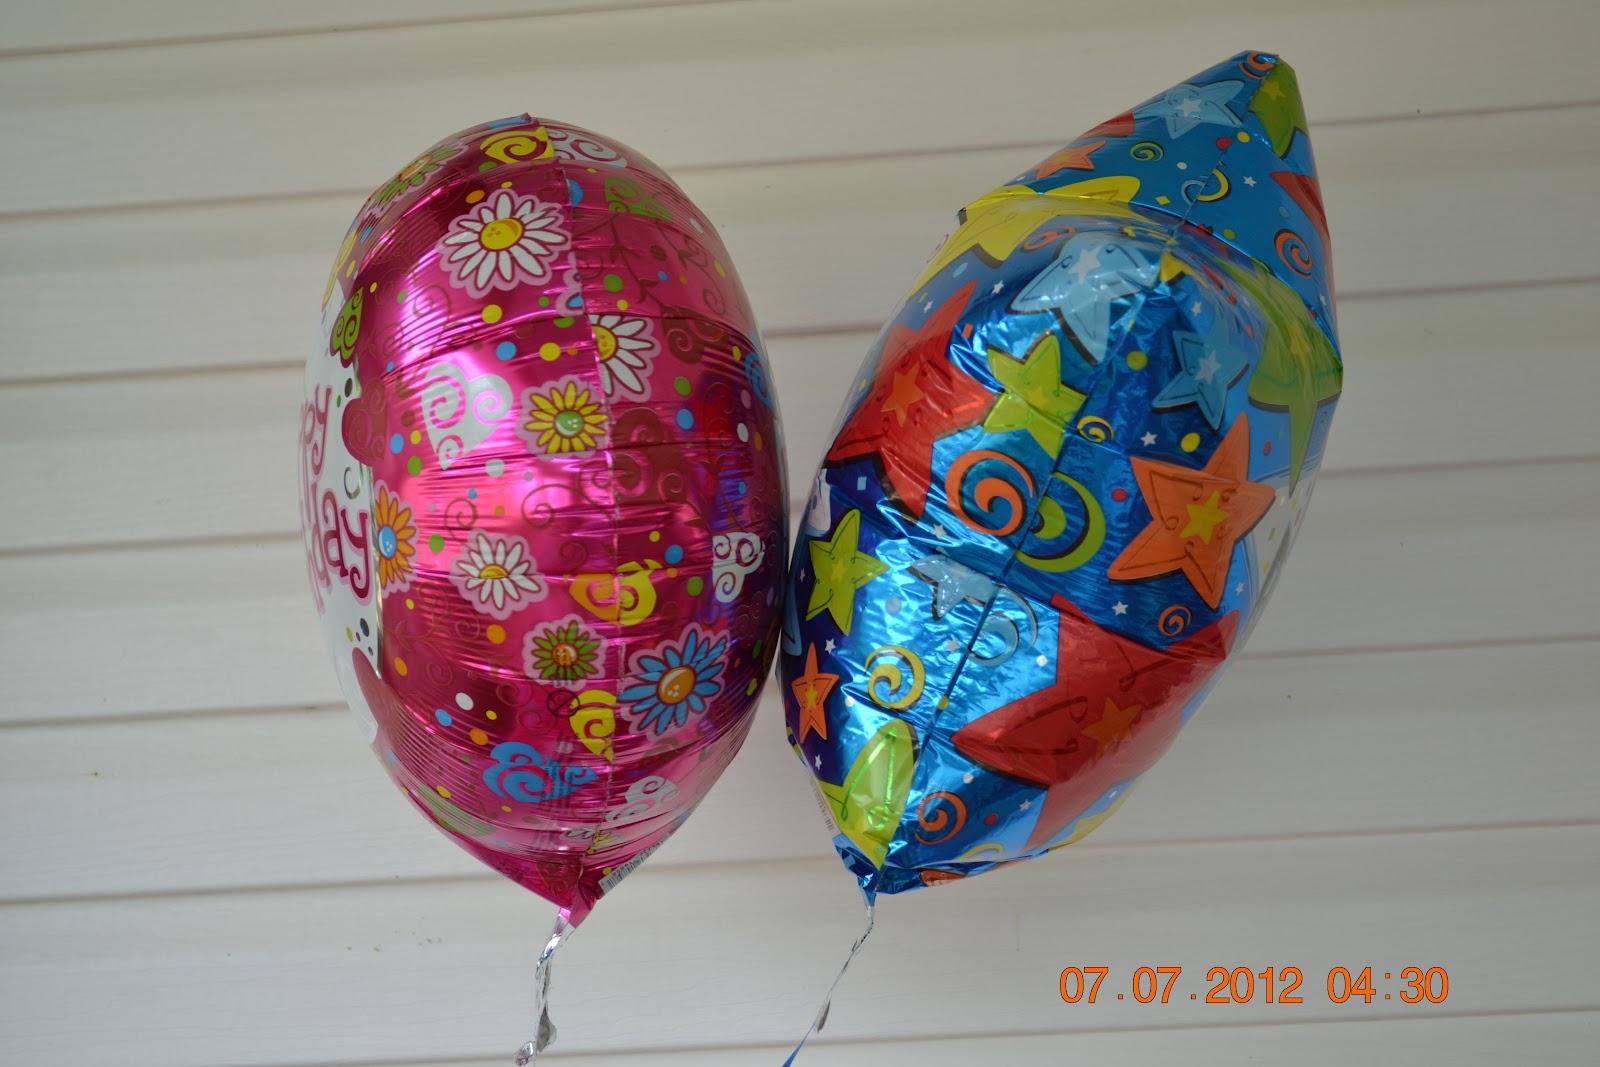 http://1.bp.blogspot.com/-PrMuCxdQp9o/UAQfY2NrV7I/AAAAAAAAtJ8/xg4Nh5uw4EM/s1600/7th+birthday+053.JPG